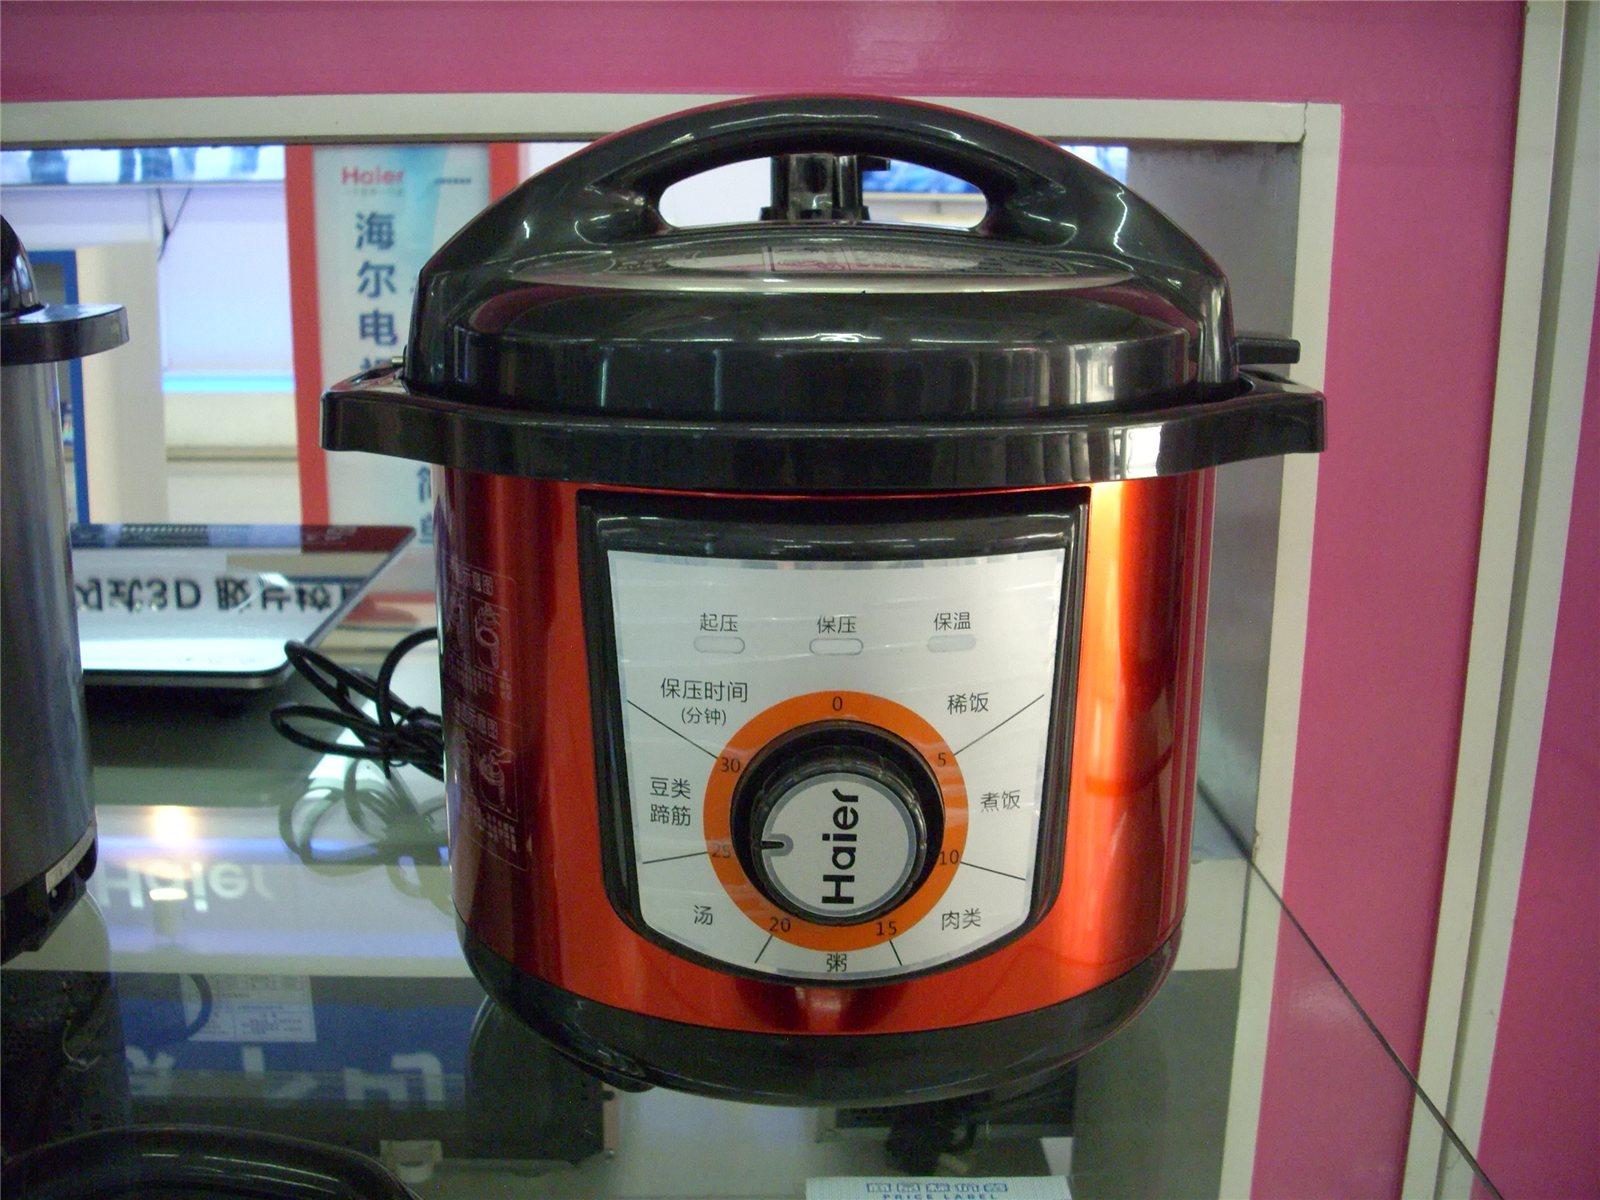 220v500w海尔电饭煲使用说明及电路原理